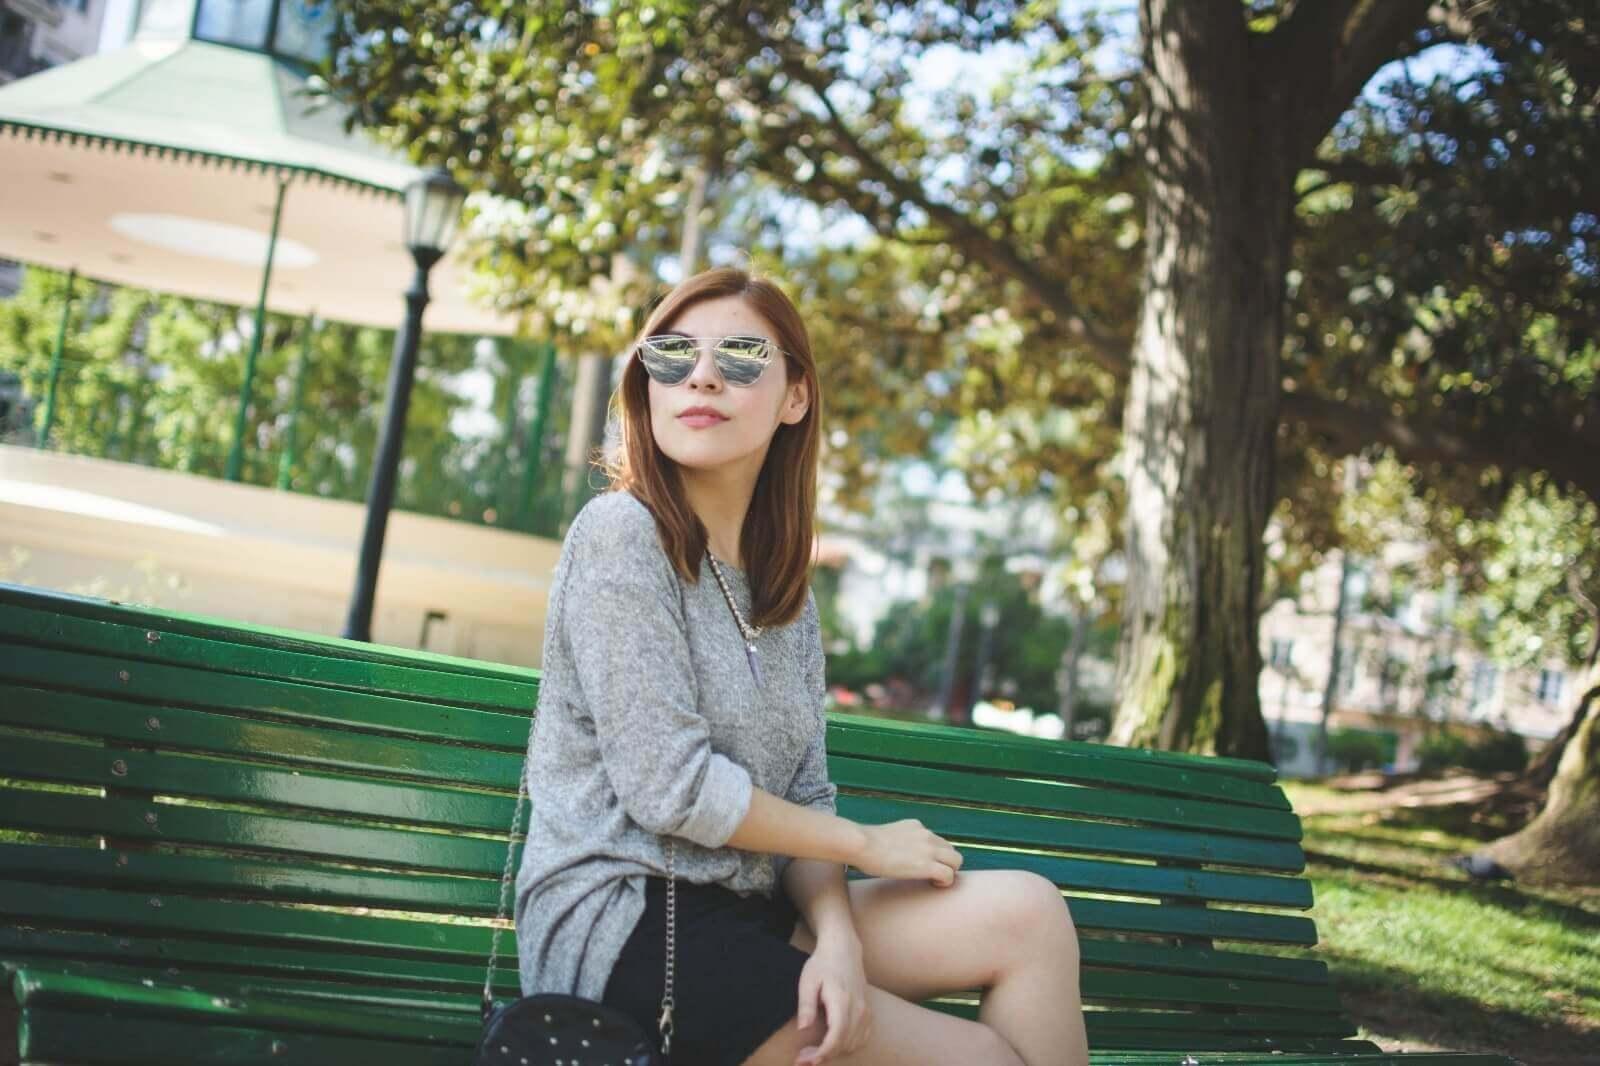 zaful-statement-shoes-silver-mirrored-sunglasses-deborah-ferrero-streetstyle-style-by-deb13